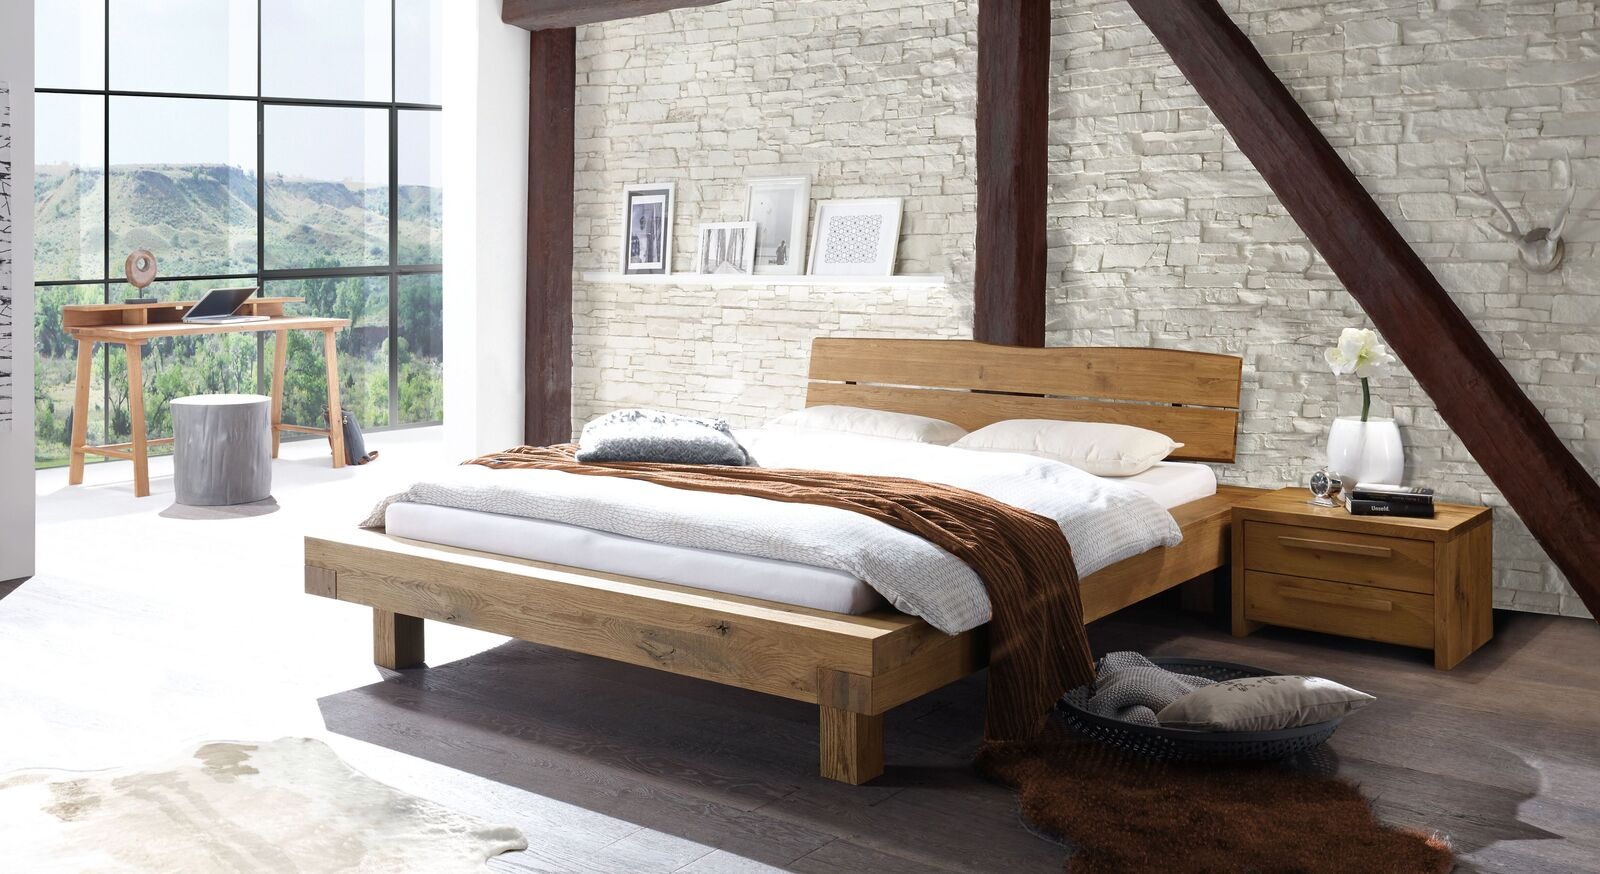 Passende Produkte zum Bett Trecera